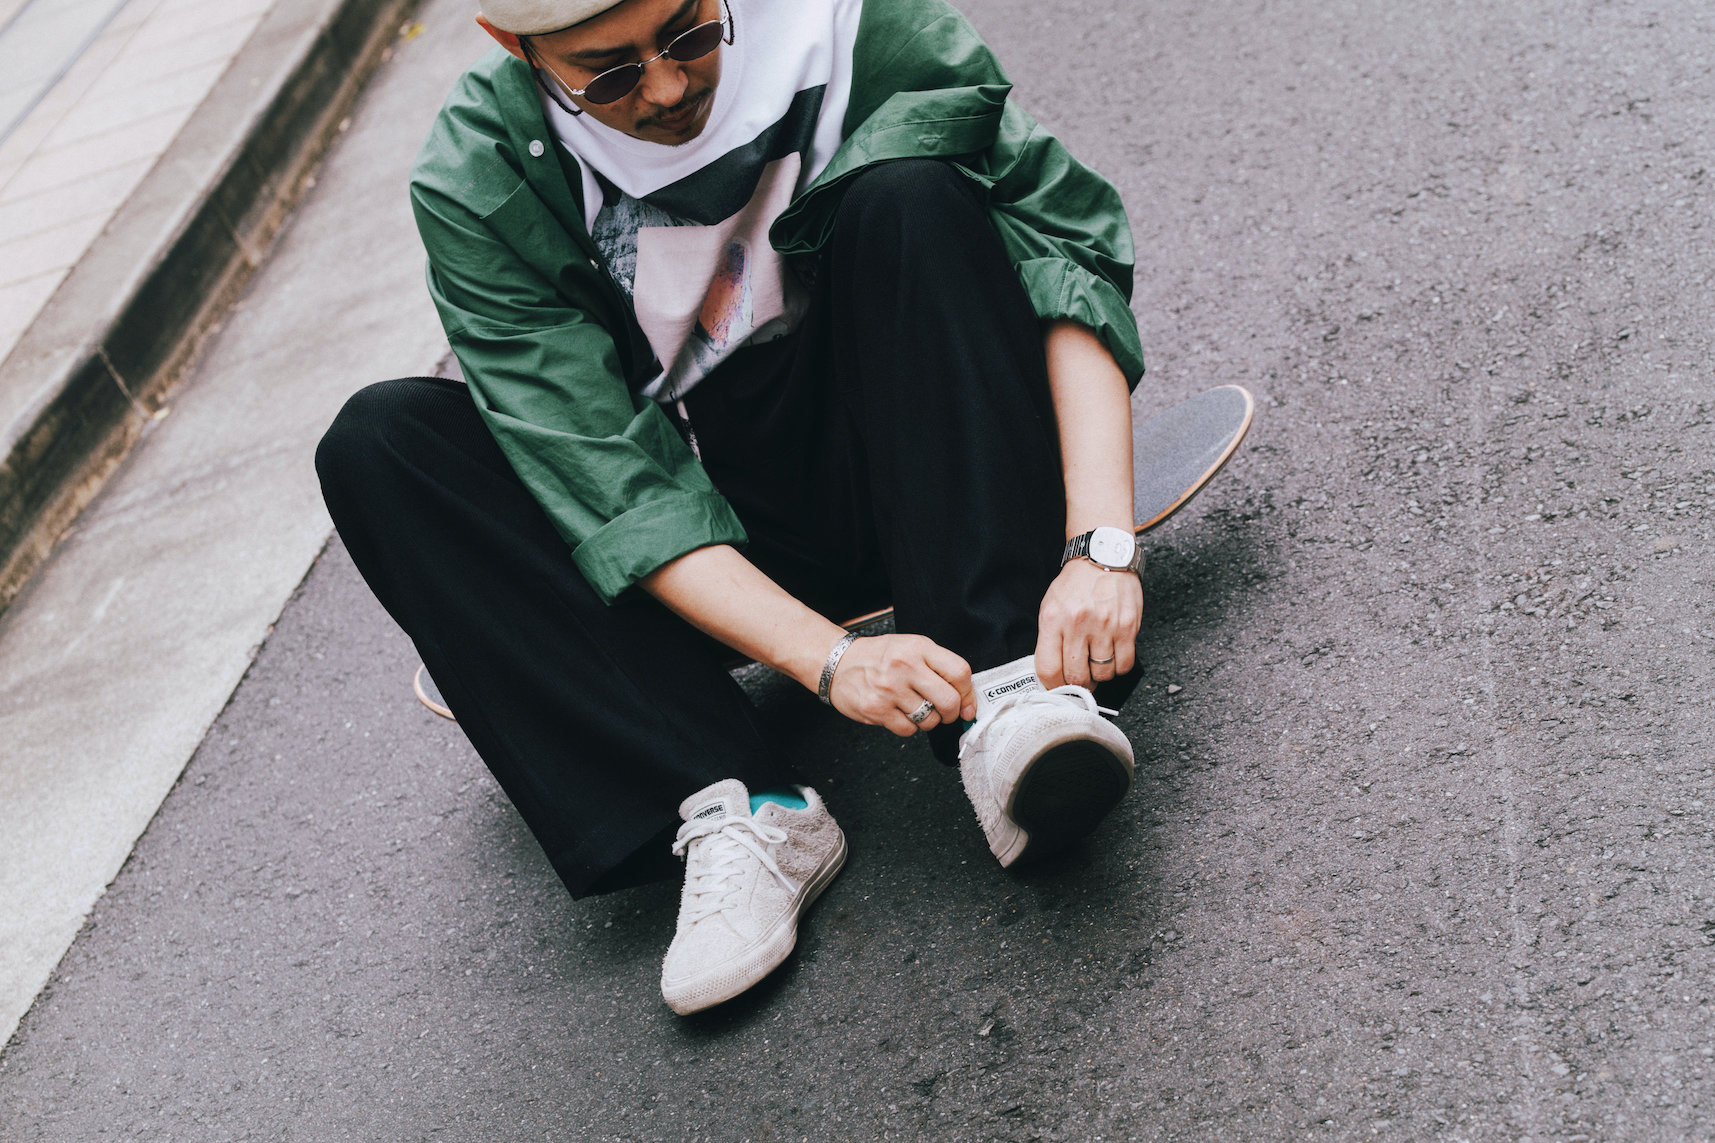 CONVERSE SKATEBOARDING、上野伸平とのショートクリップ公開